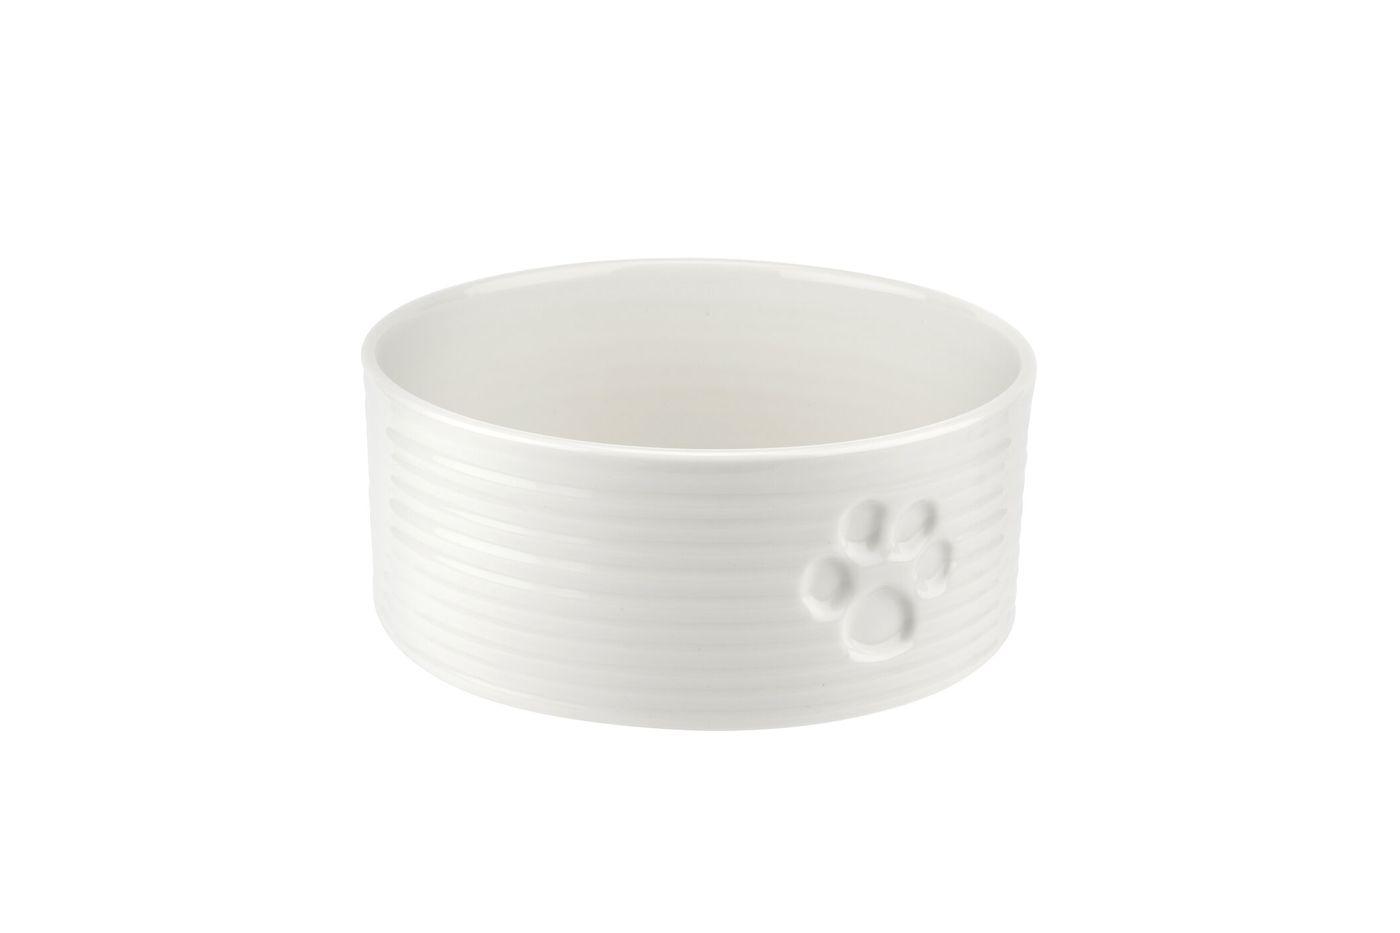 Sophie Conran for Portmeirion White Pet Bowl 15.25cm thumb 3